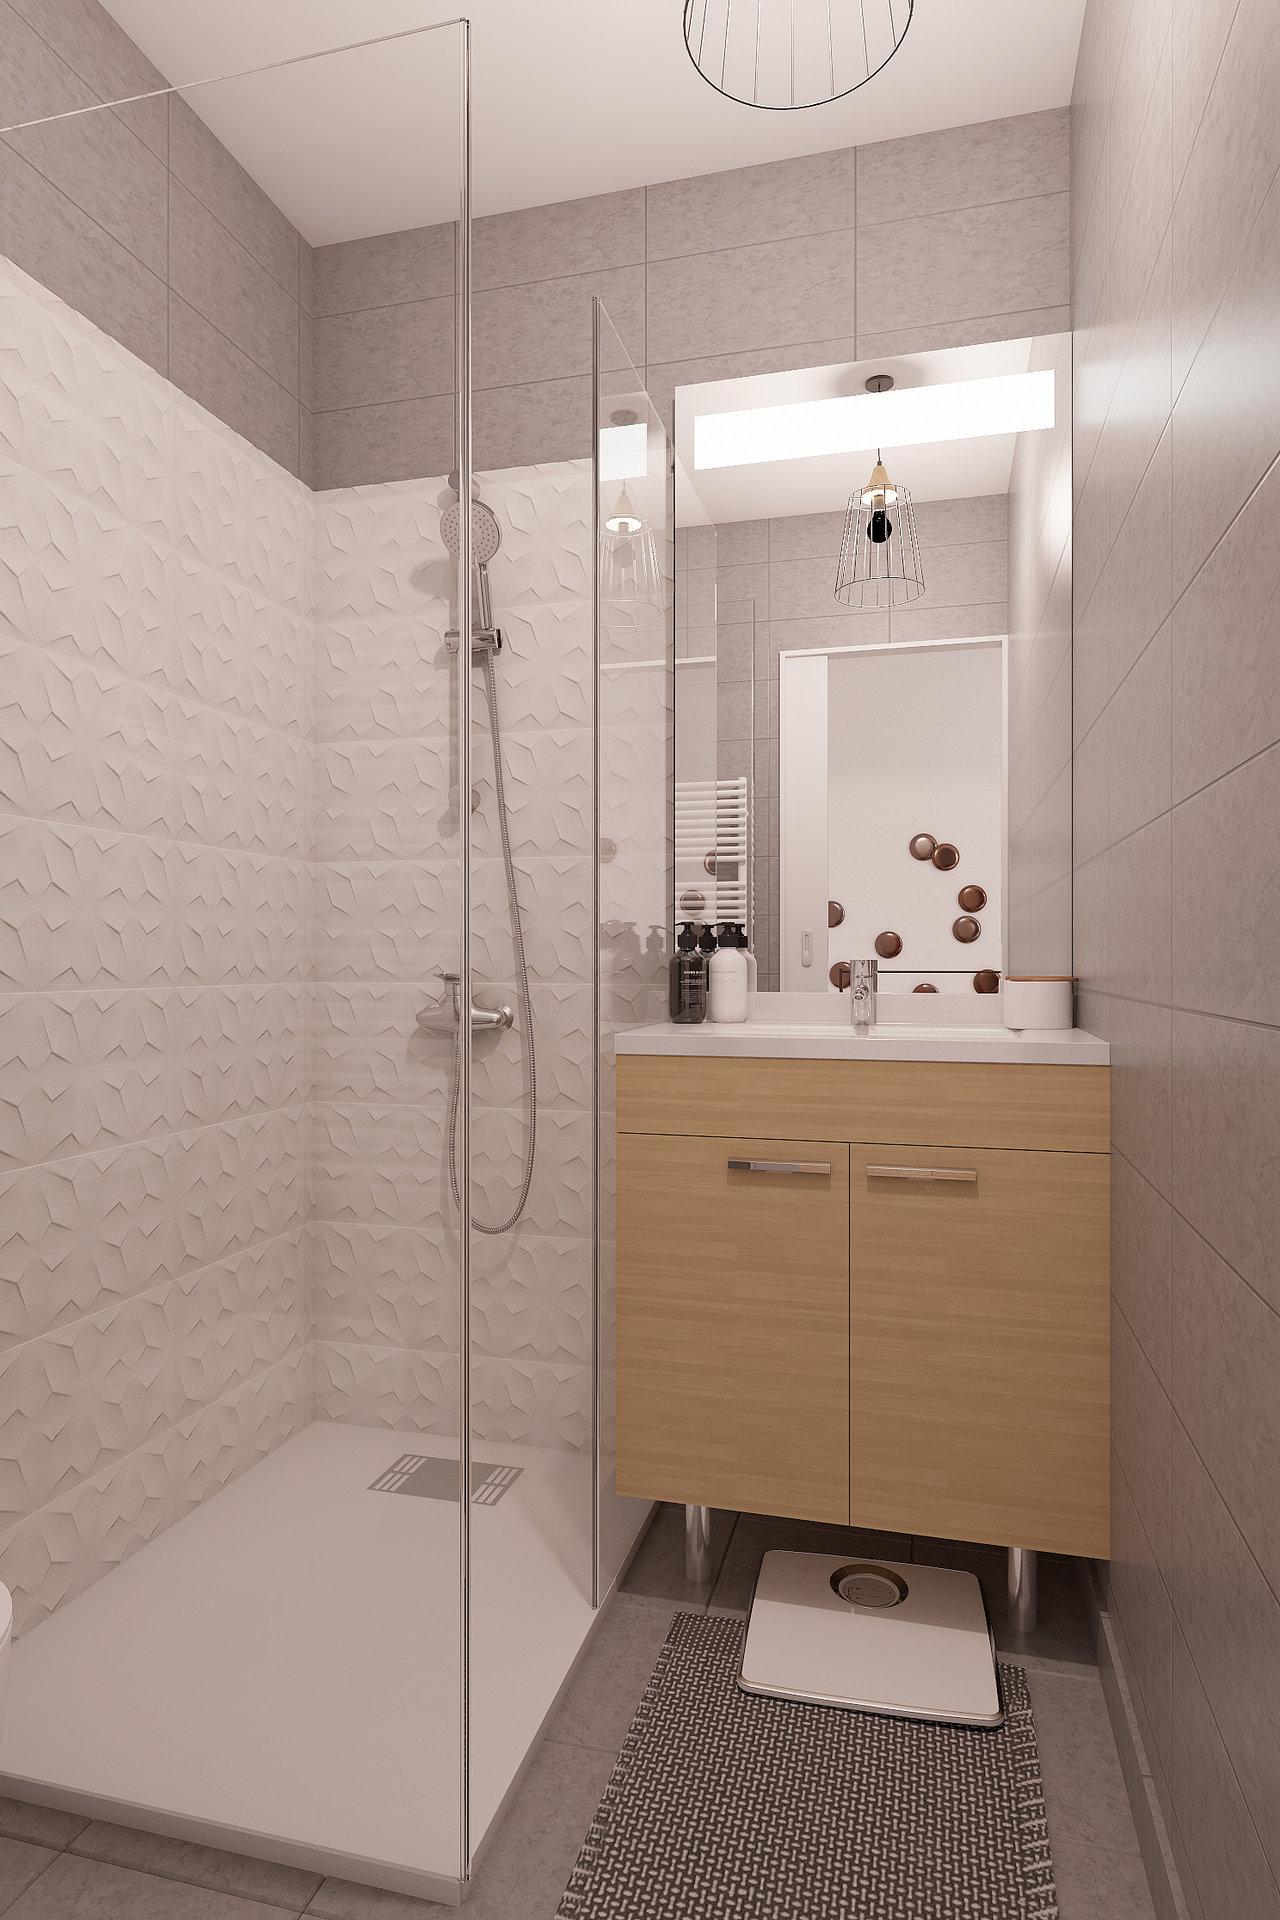 Carabacel/Dubouchage. 1 bedroom duplex apartment under renovation with interior courtyard.